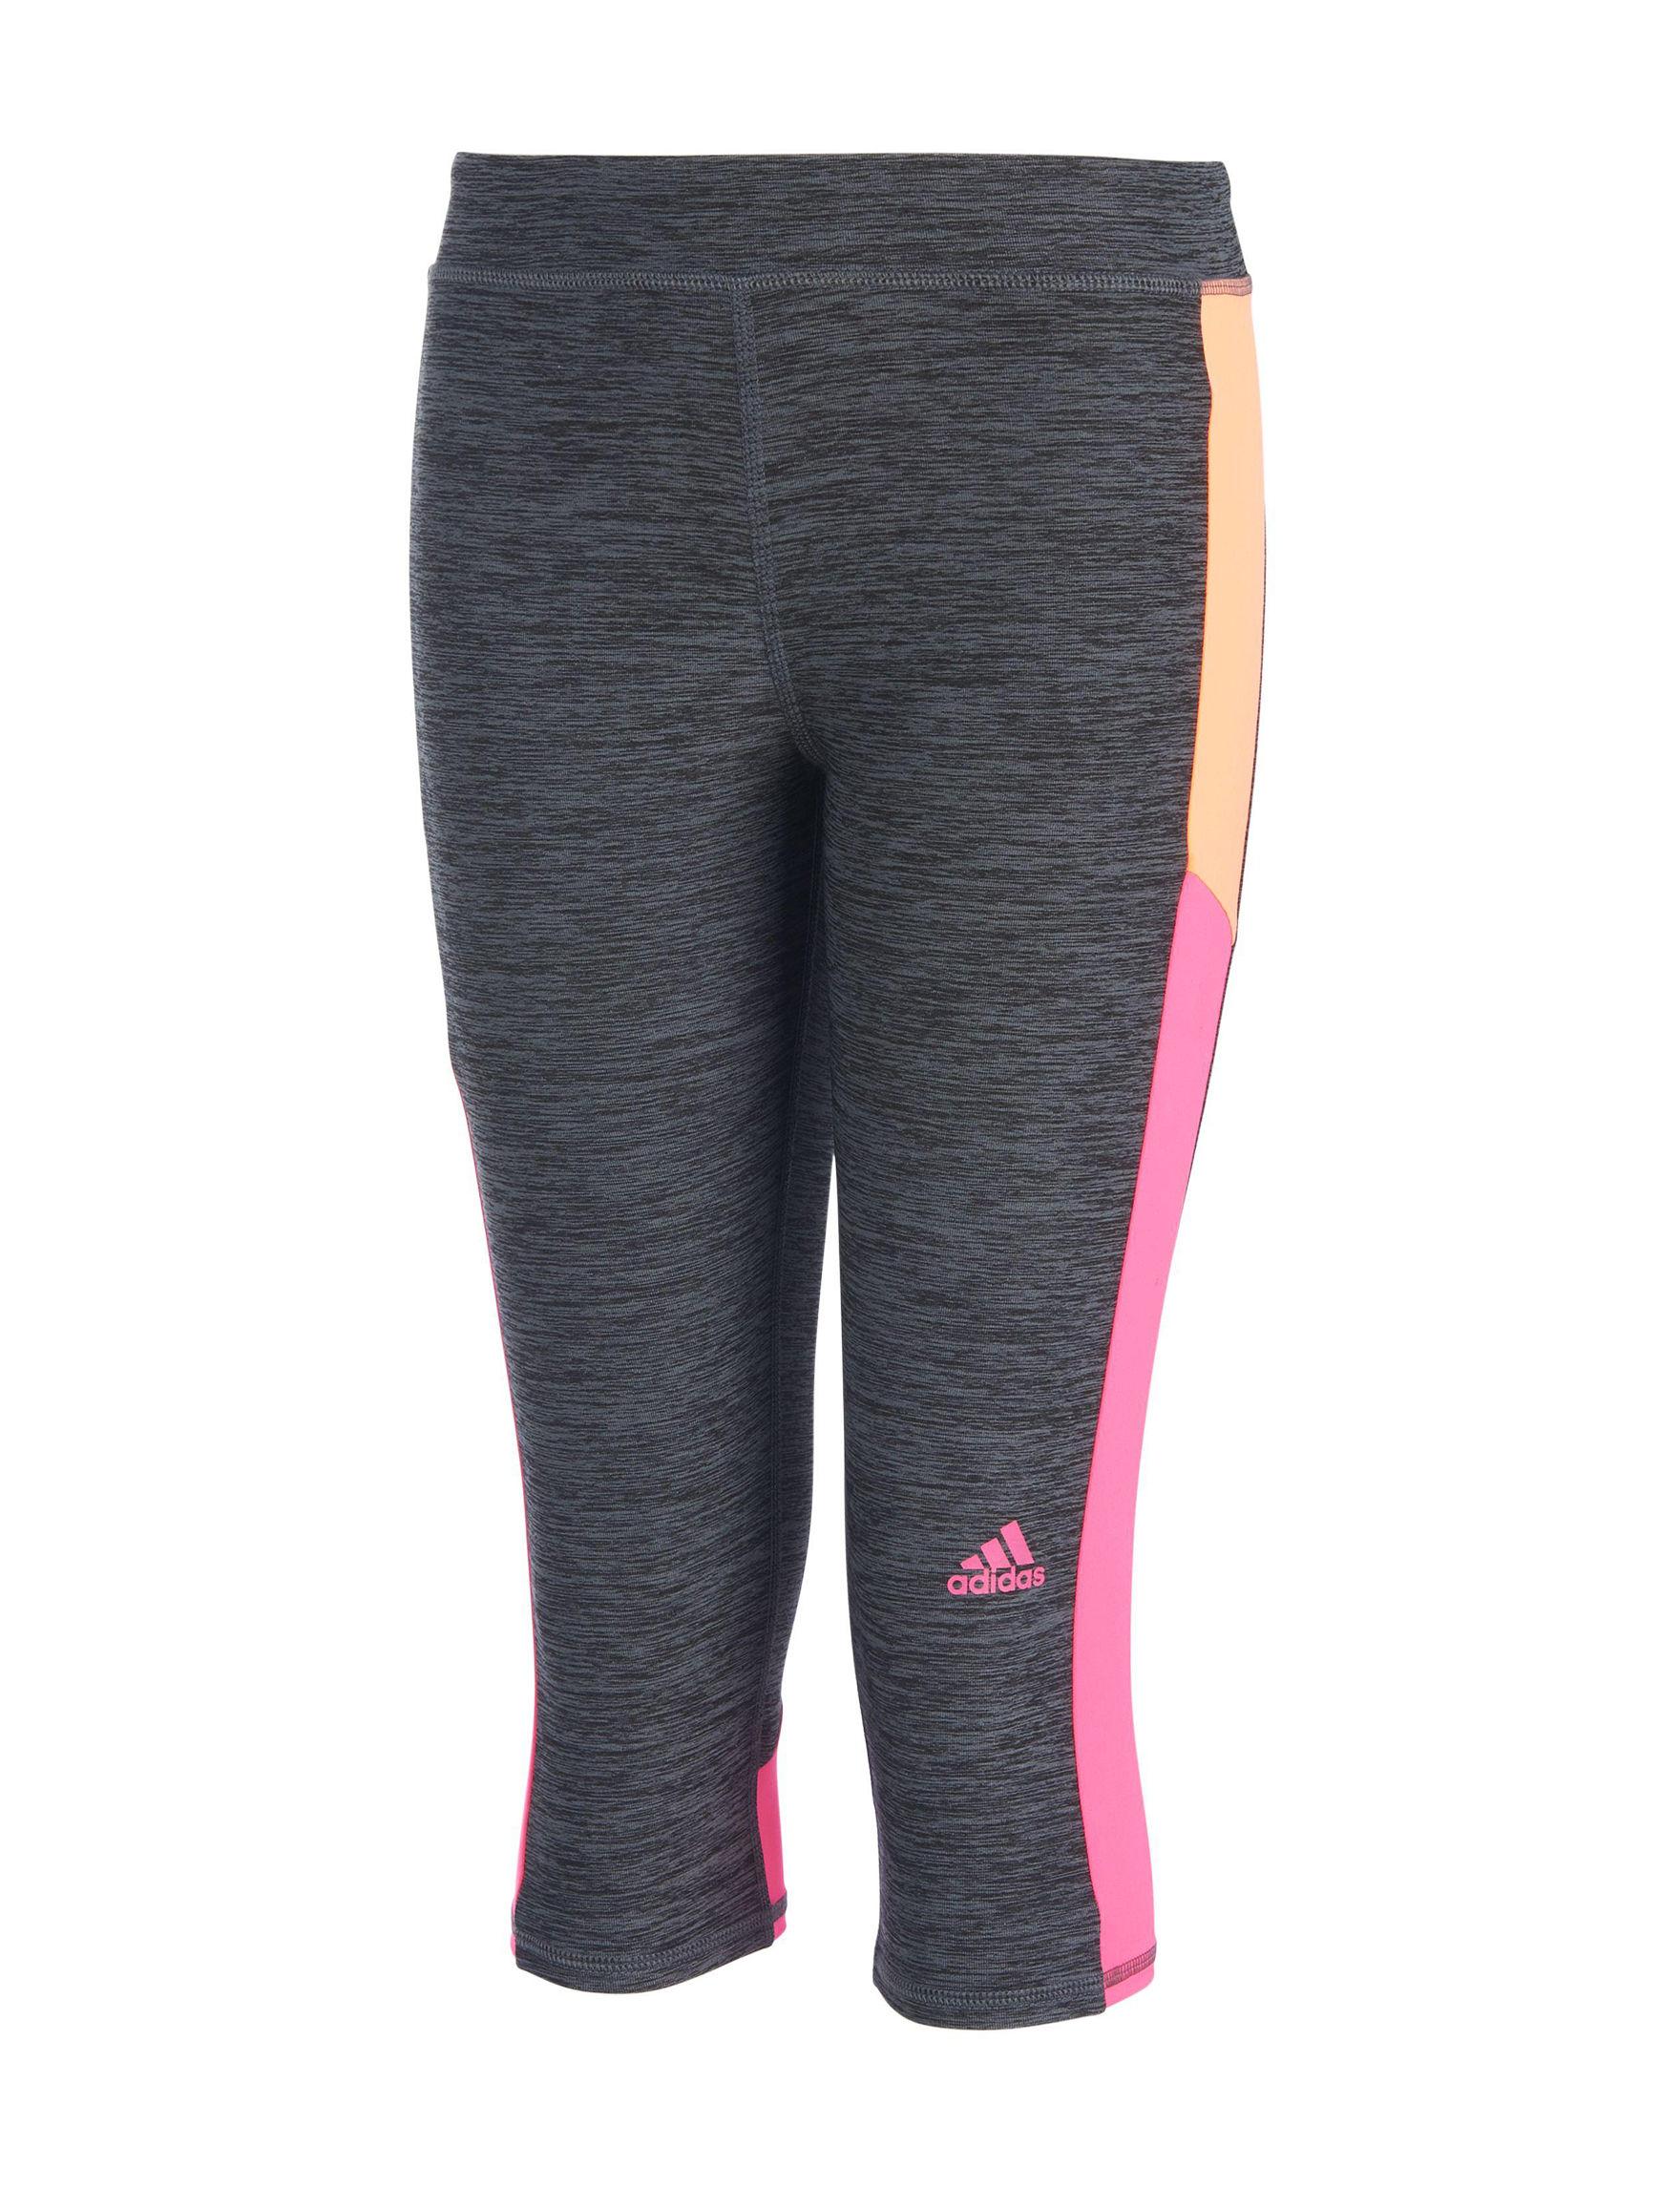 Adidas Grey / Pink